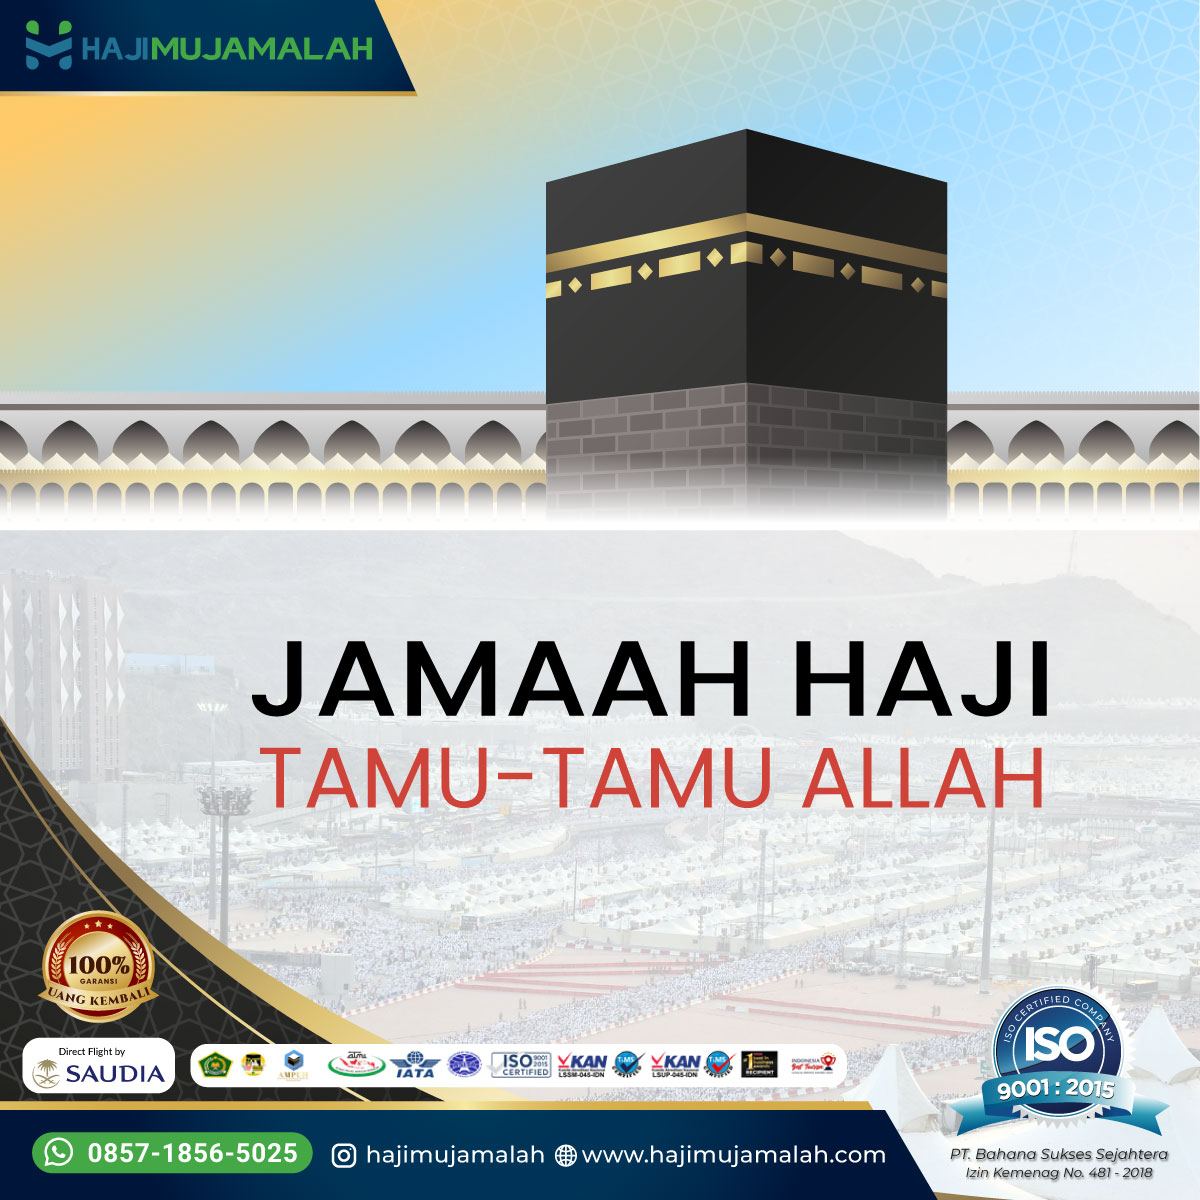 Bekal Haji - Jama'ah Haji adalah Tamu-Tamu Allah